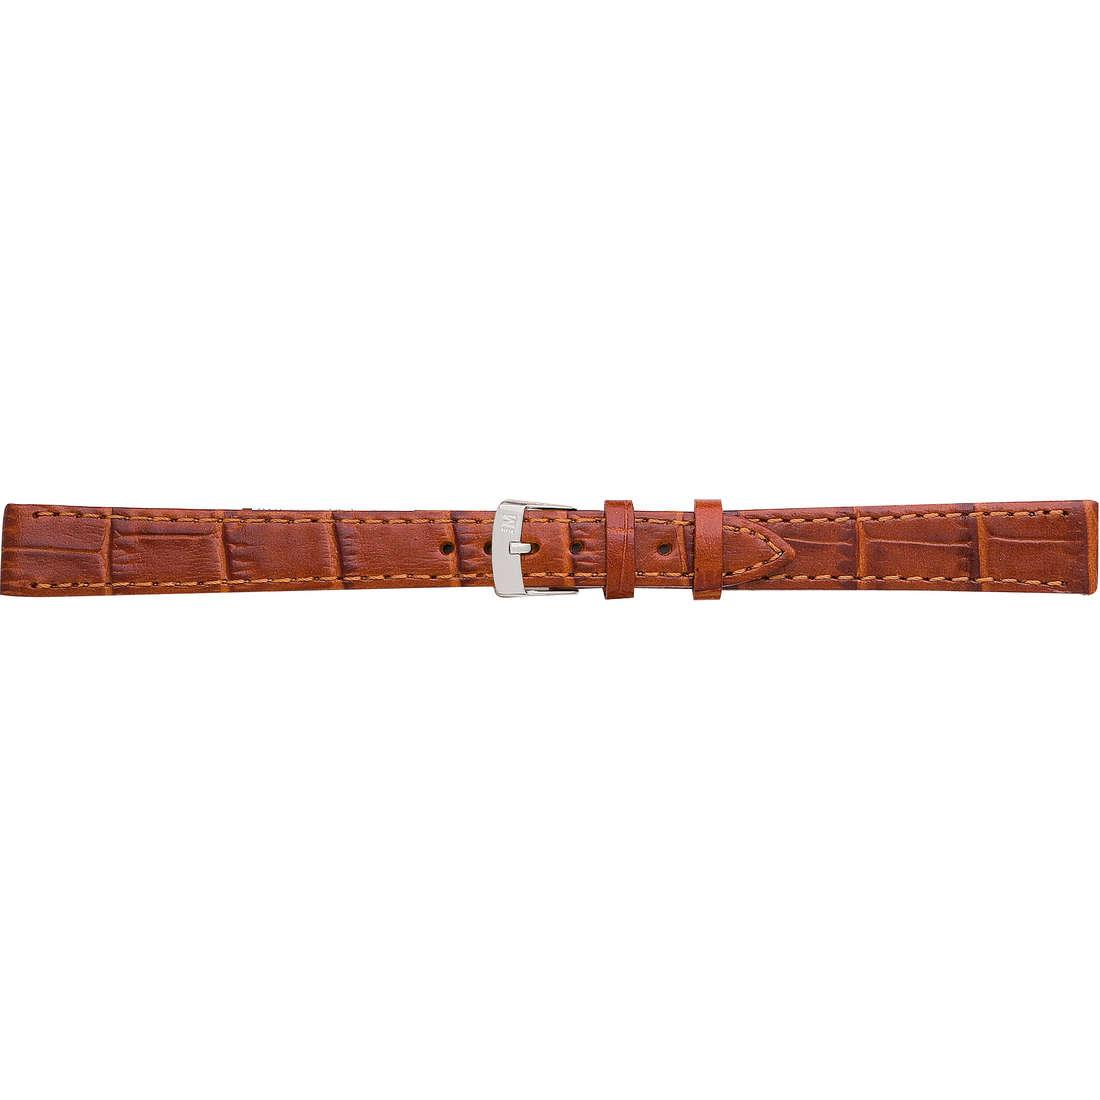 montre bande de montres unisex Morellato I Lunghi A01Y2524656041CR16